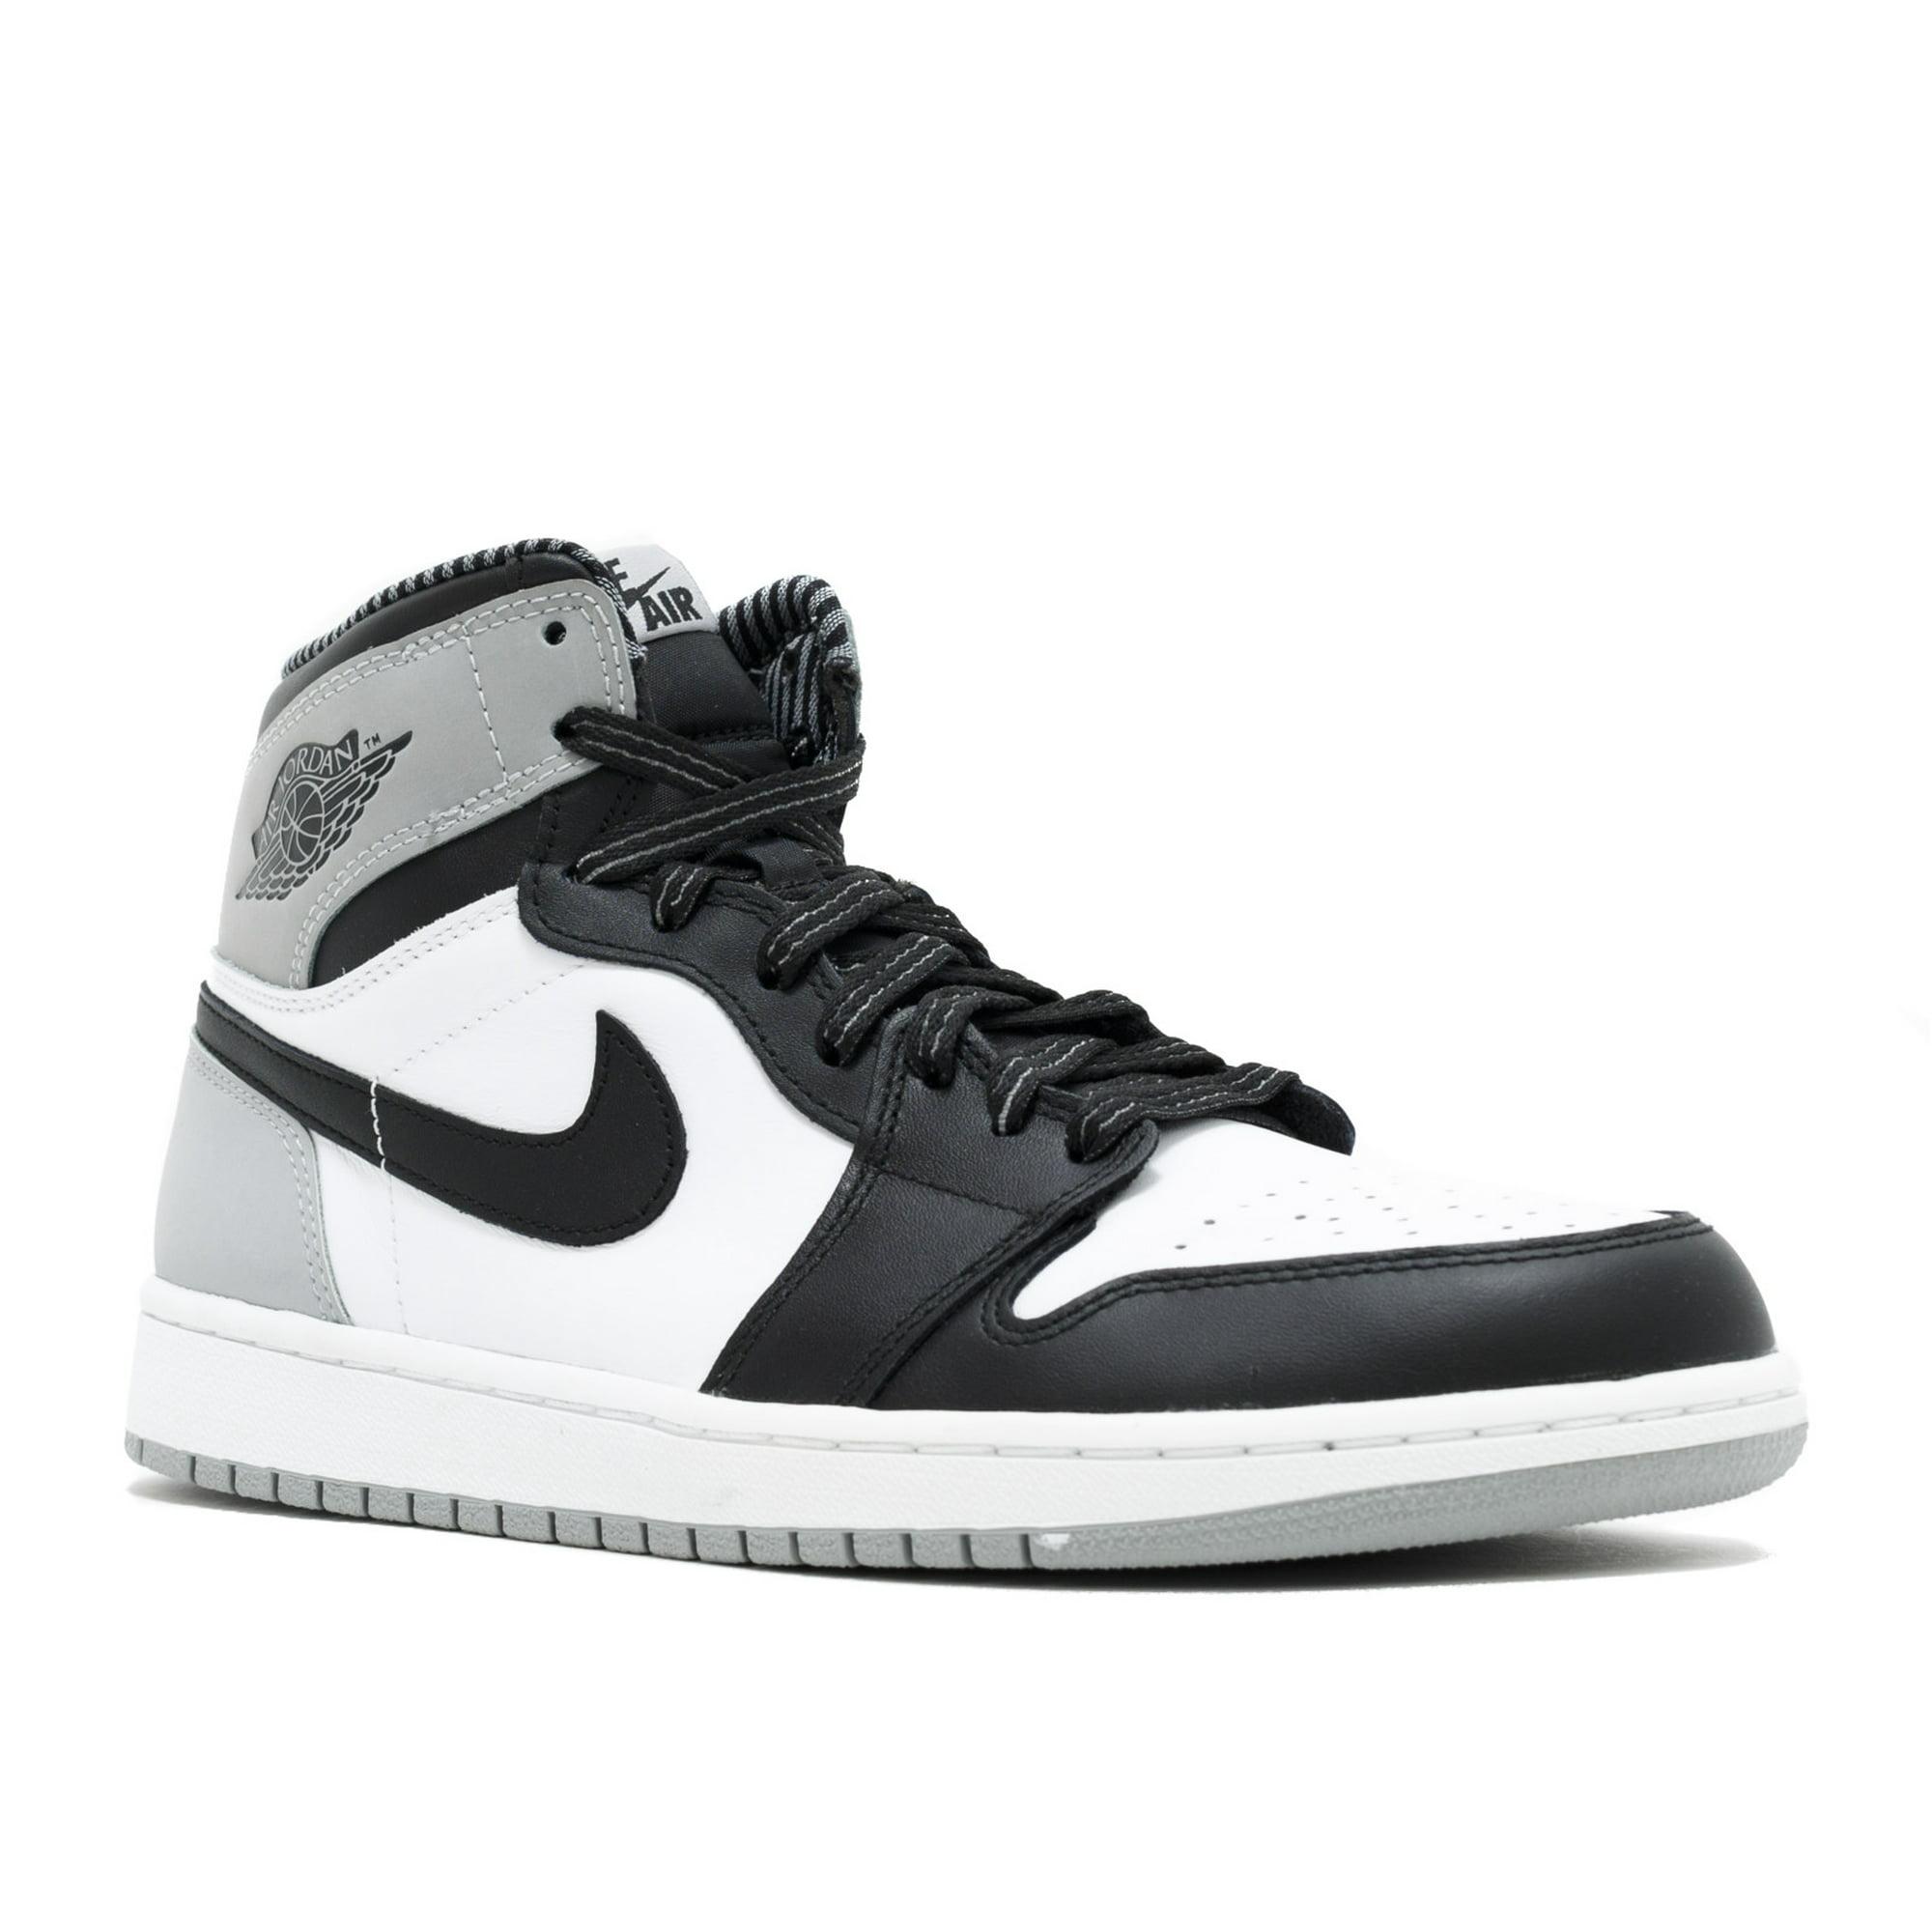 low priced e5d45 07b41 Air Jordan - Men - Air Jordan 1 Retro High Og  Barons  - 555088-104 - Size  11   Walmart Canada